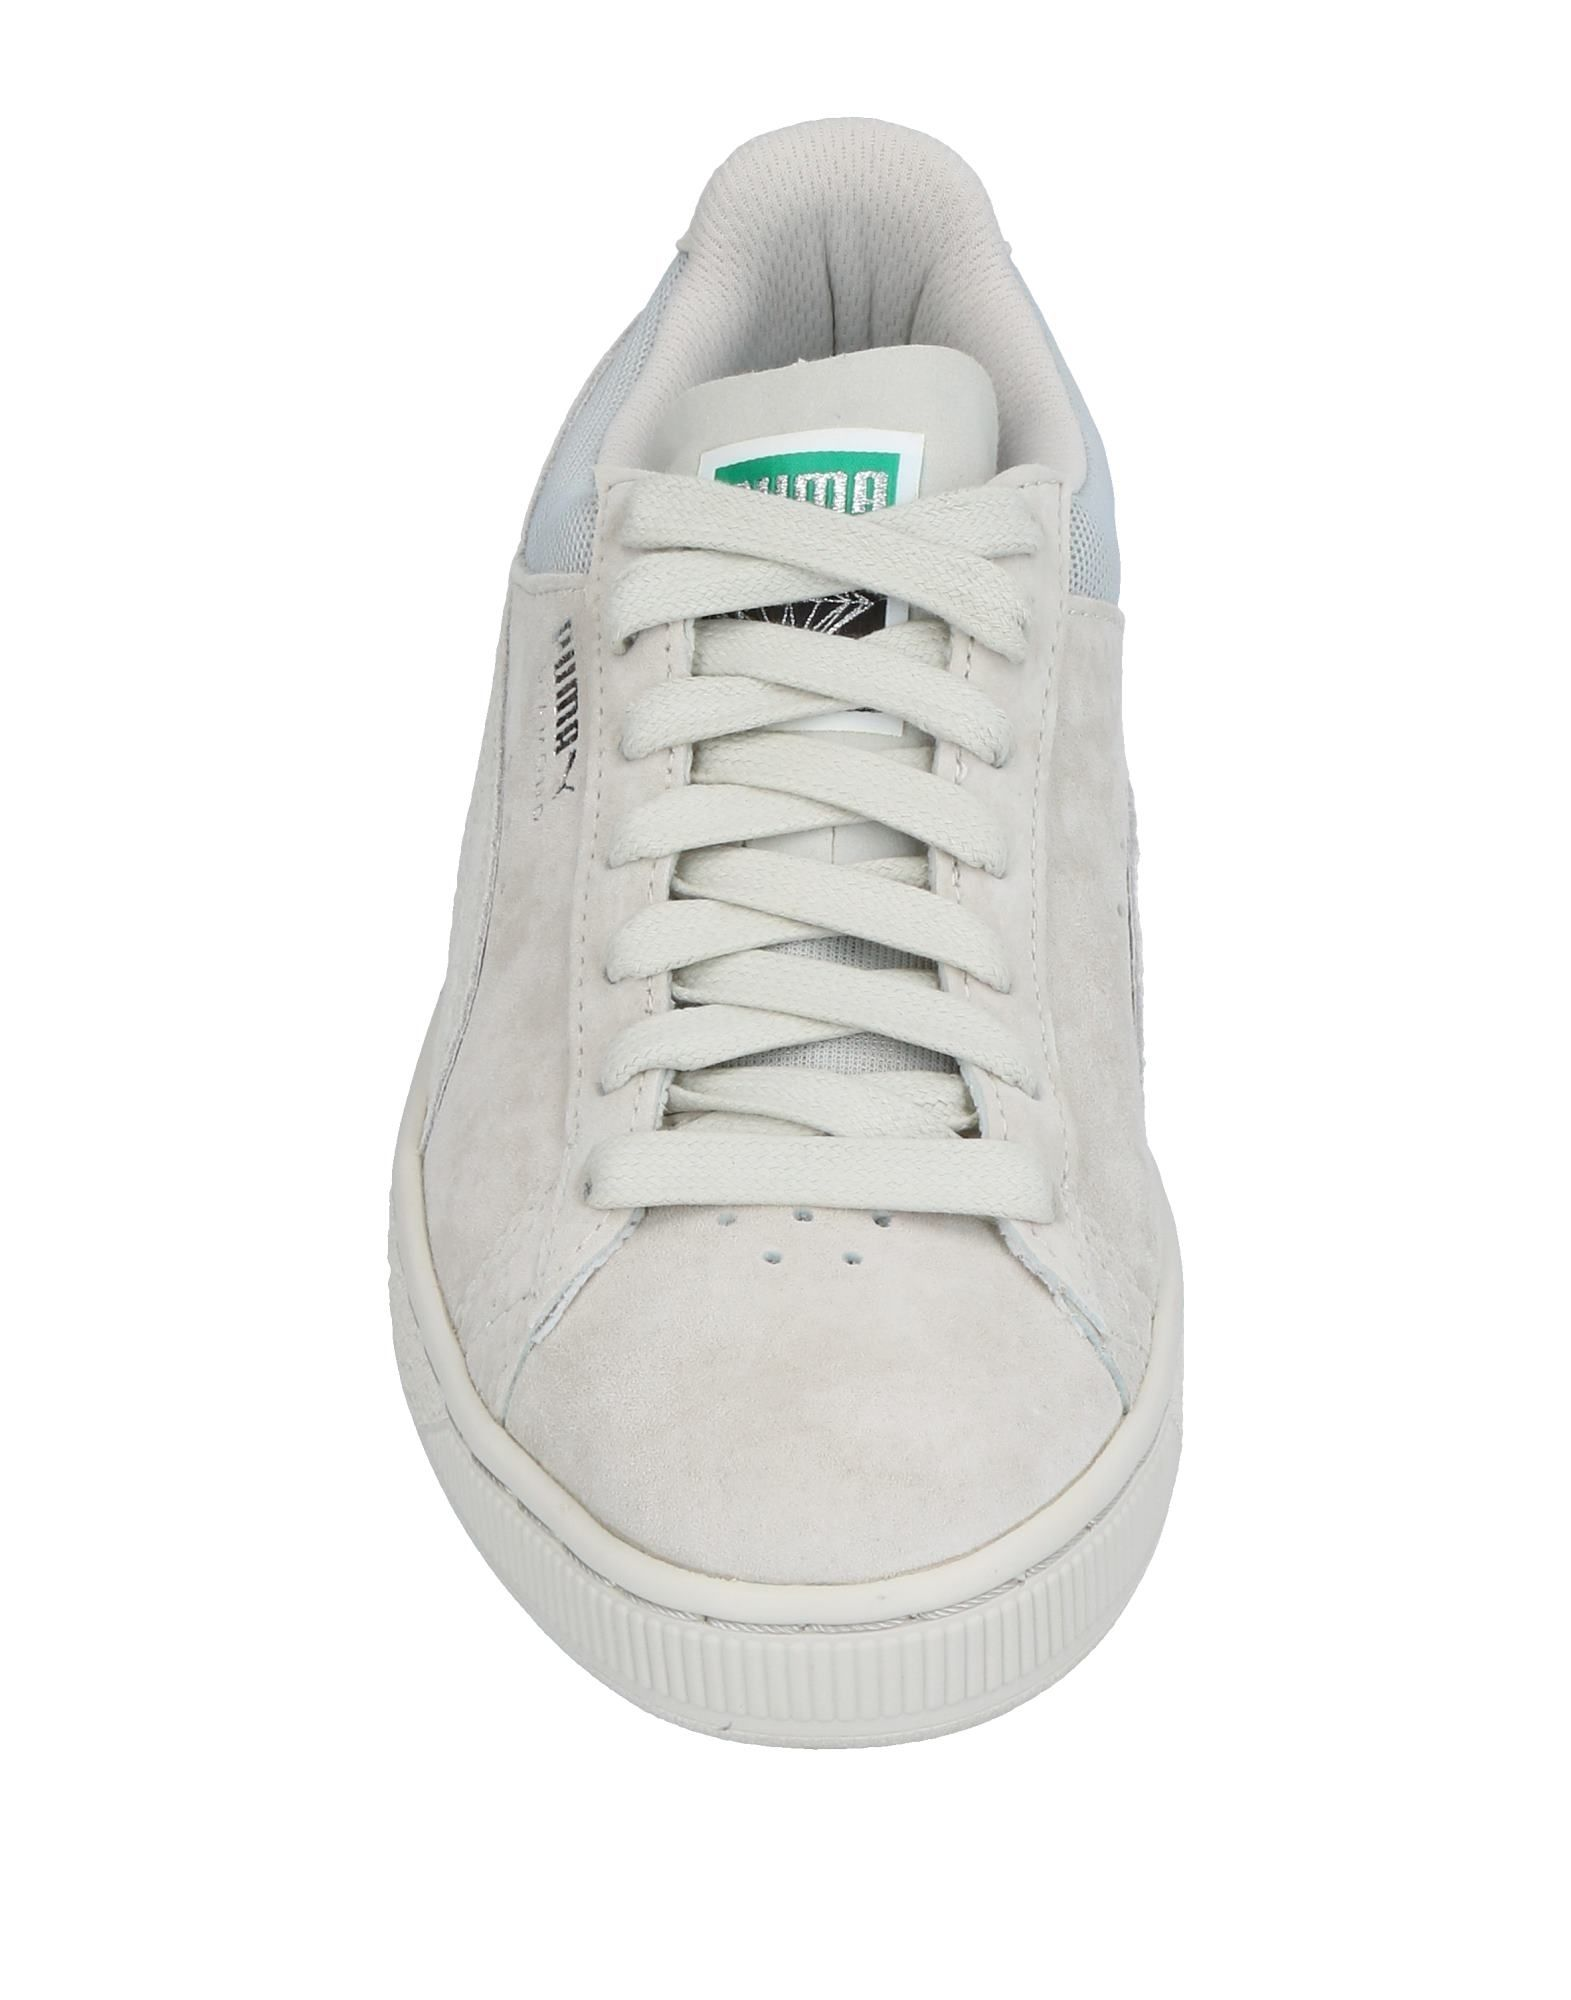 Puma Sneakers Herren  11360480IA Heiße Schuhe 4d998f